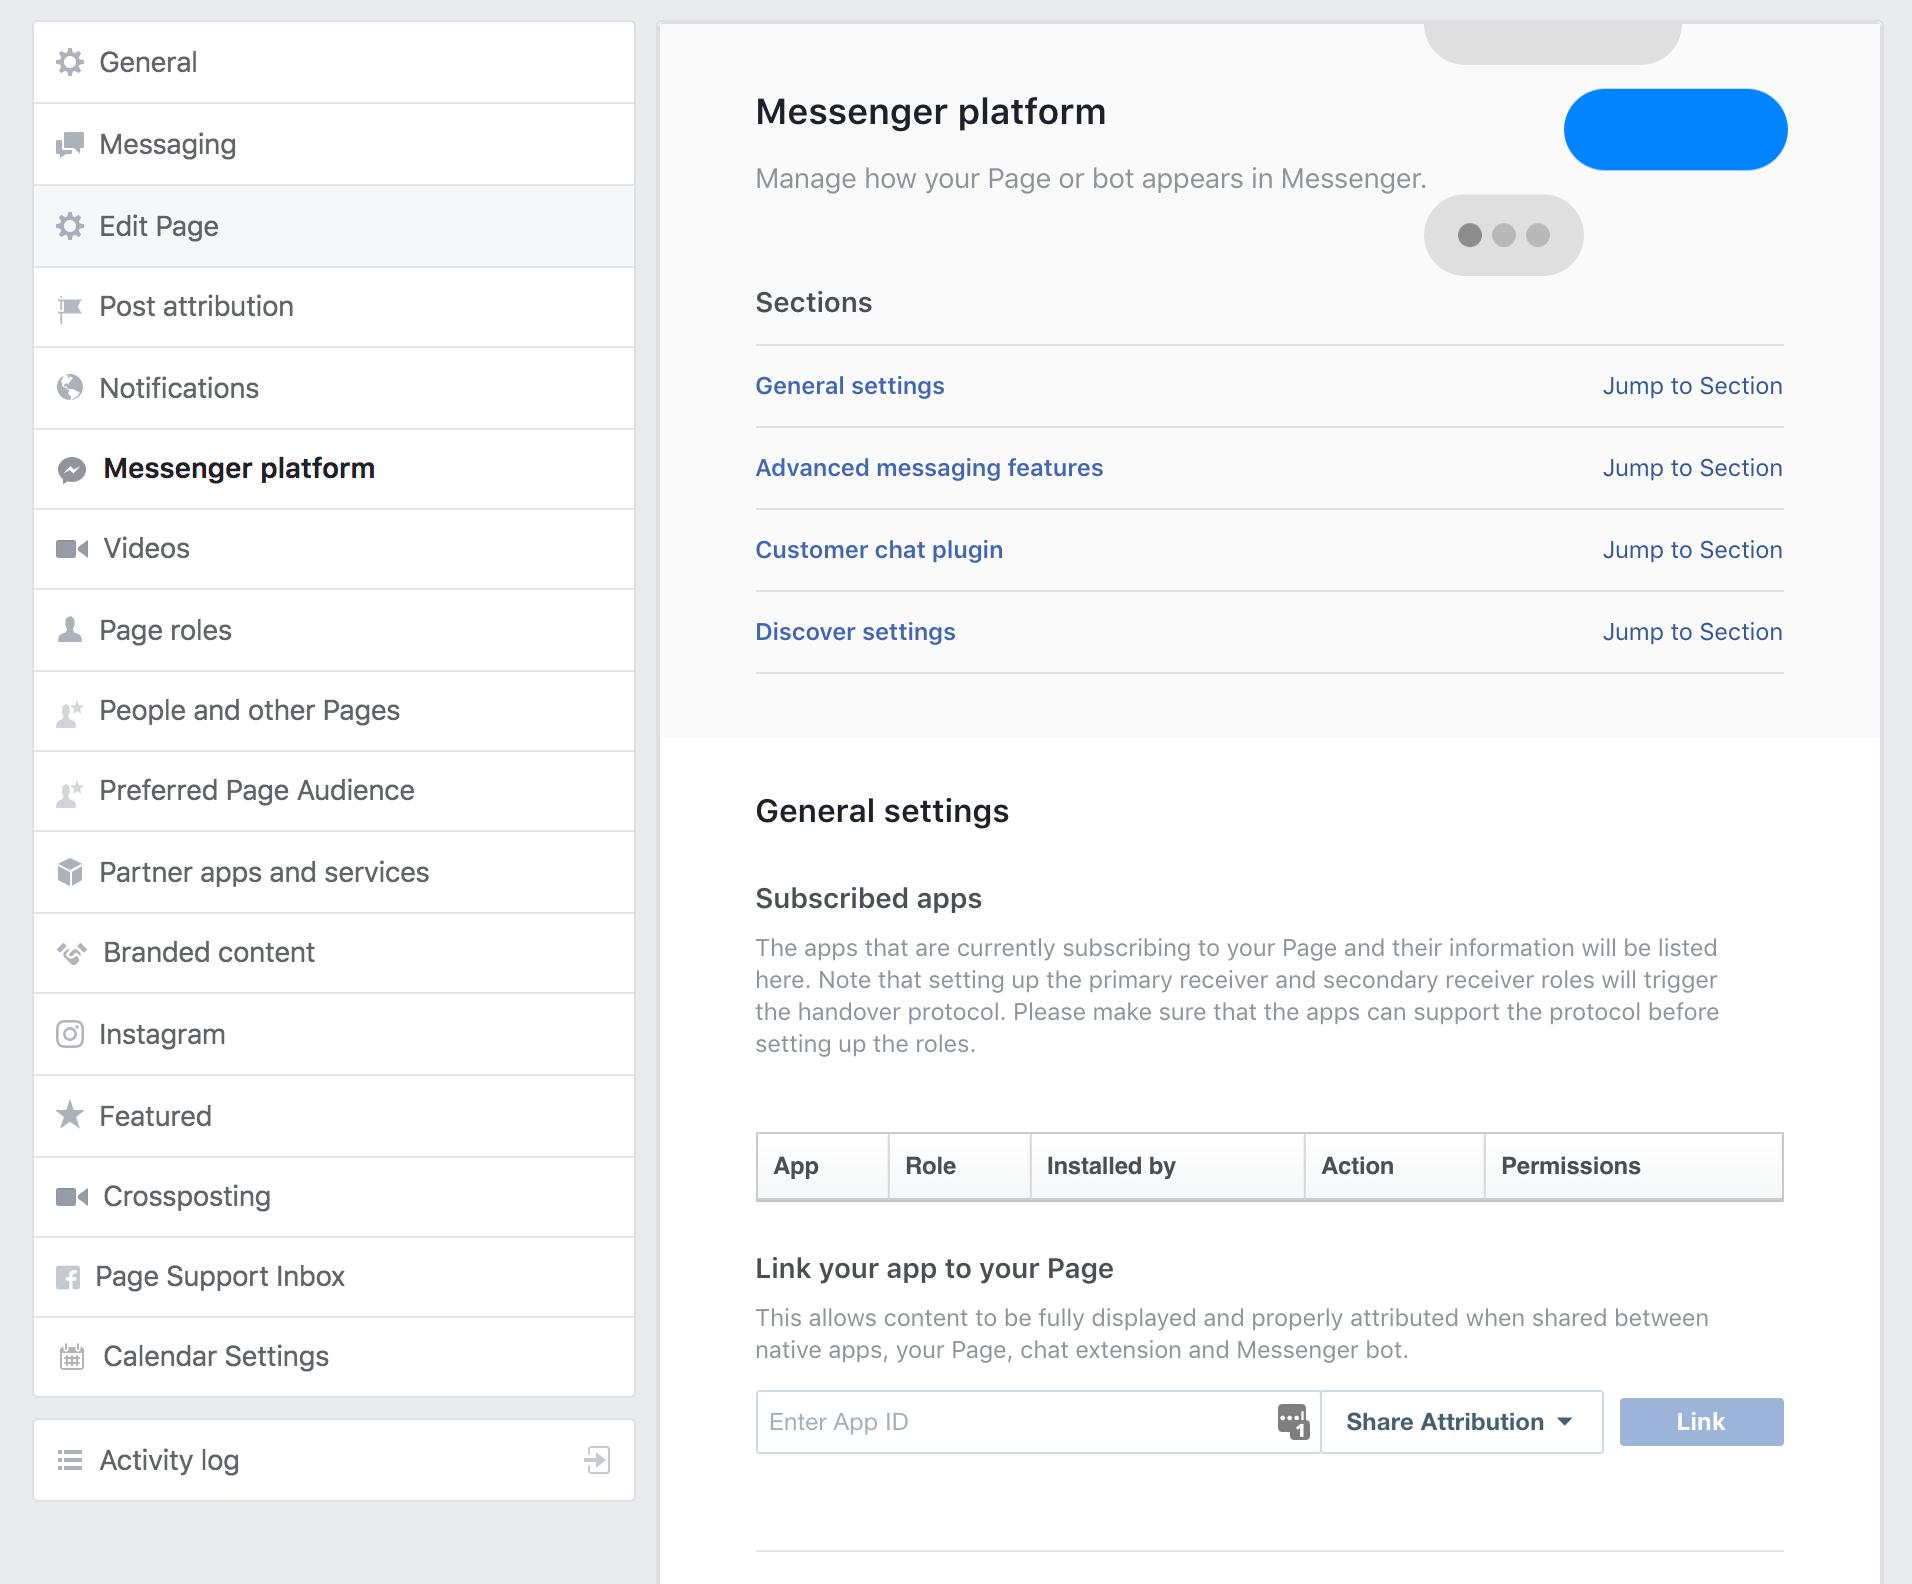 Screenshot showing messenger platform settings